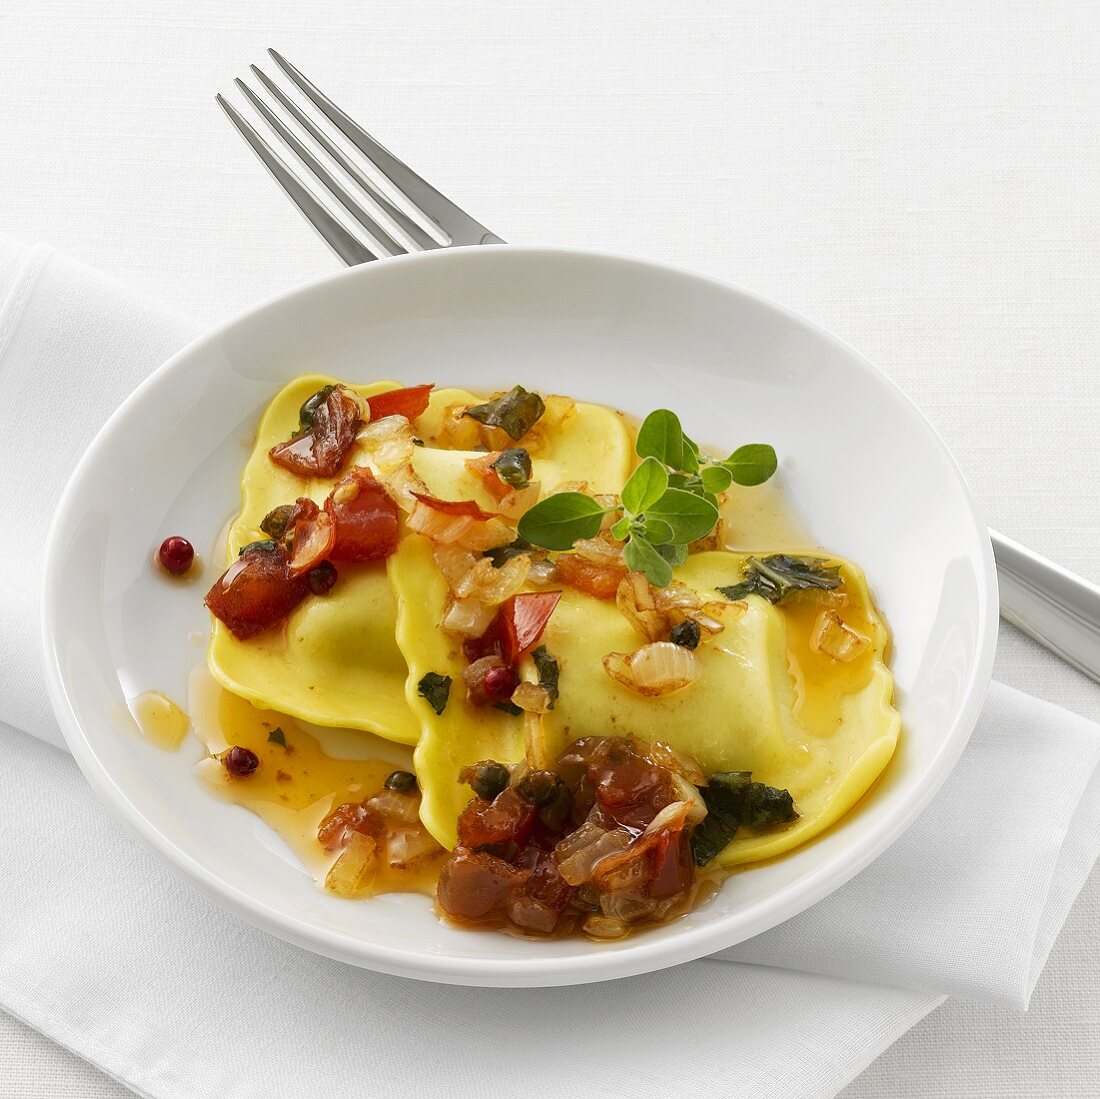 Ravioli with onion, tomato and pepper